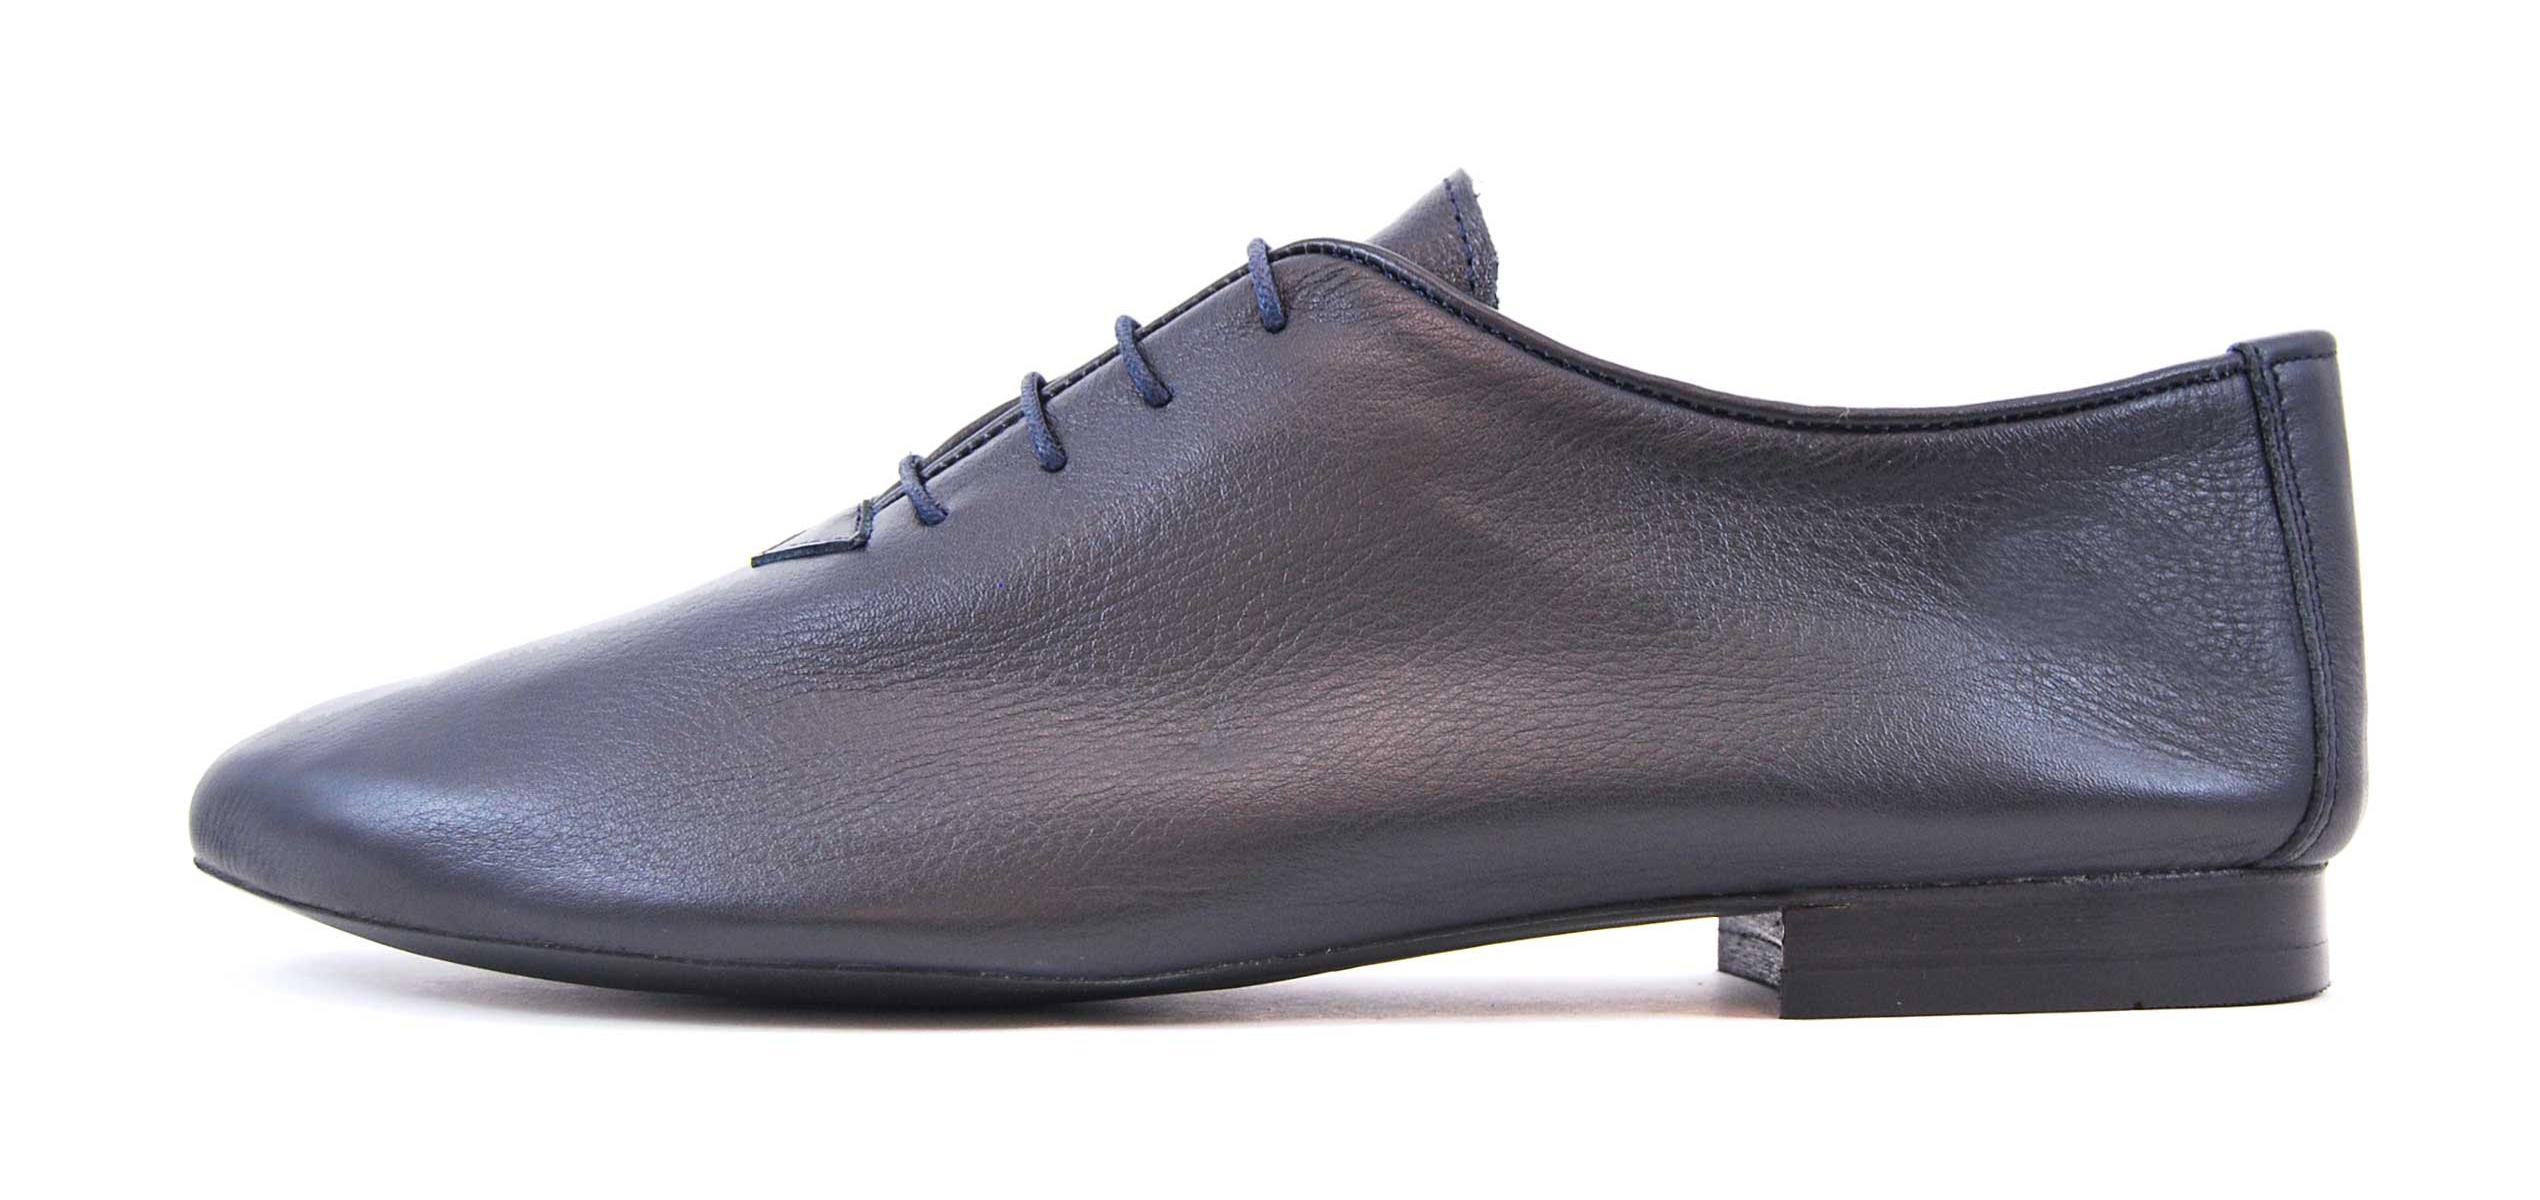 Foto 1 de Zapatos Julio Iglesias Cordon 529 JC Marino Napa